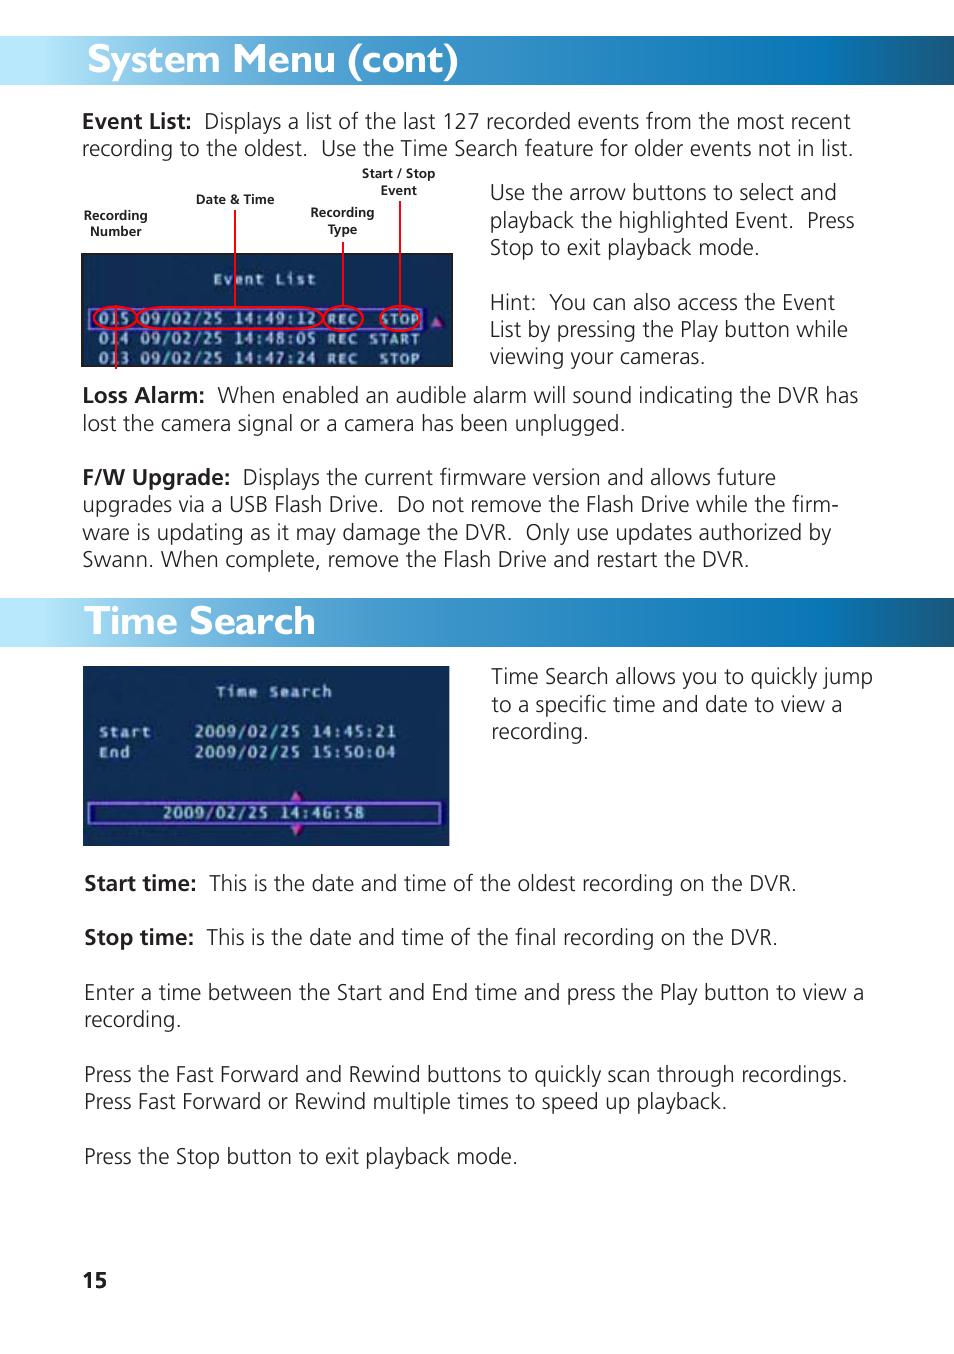 System menu (cont), Time search | Swann DVR4-950 User Manual